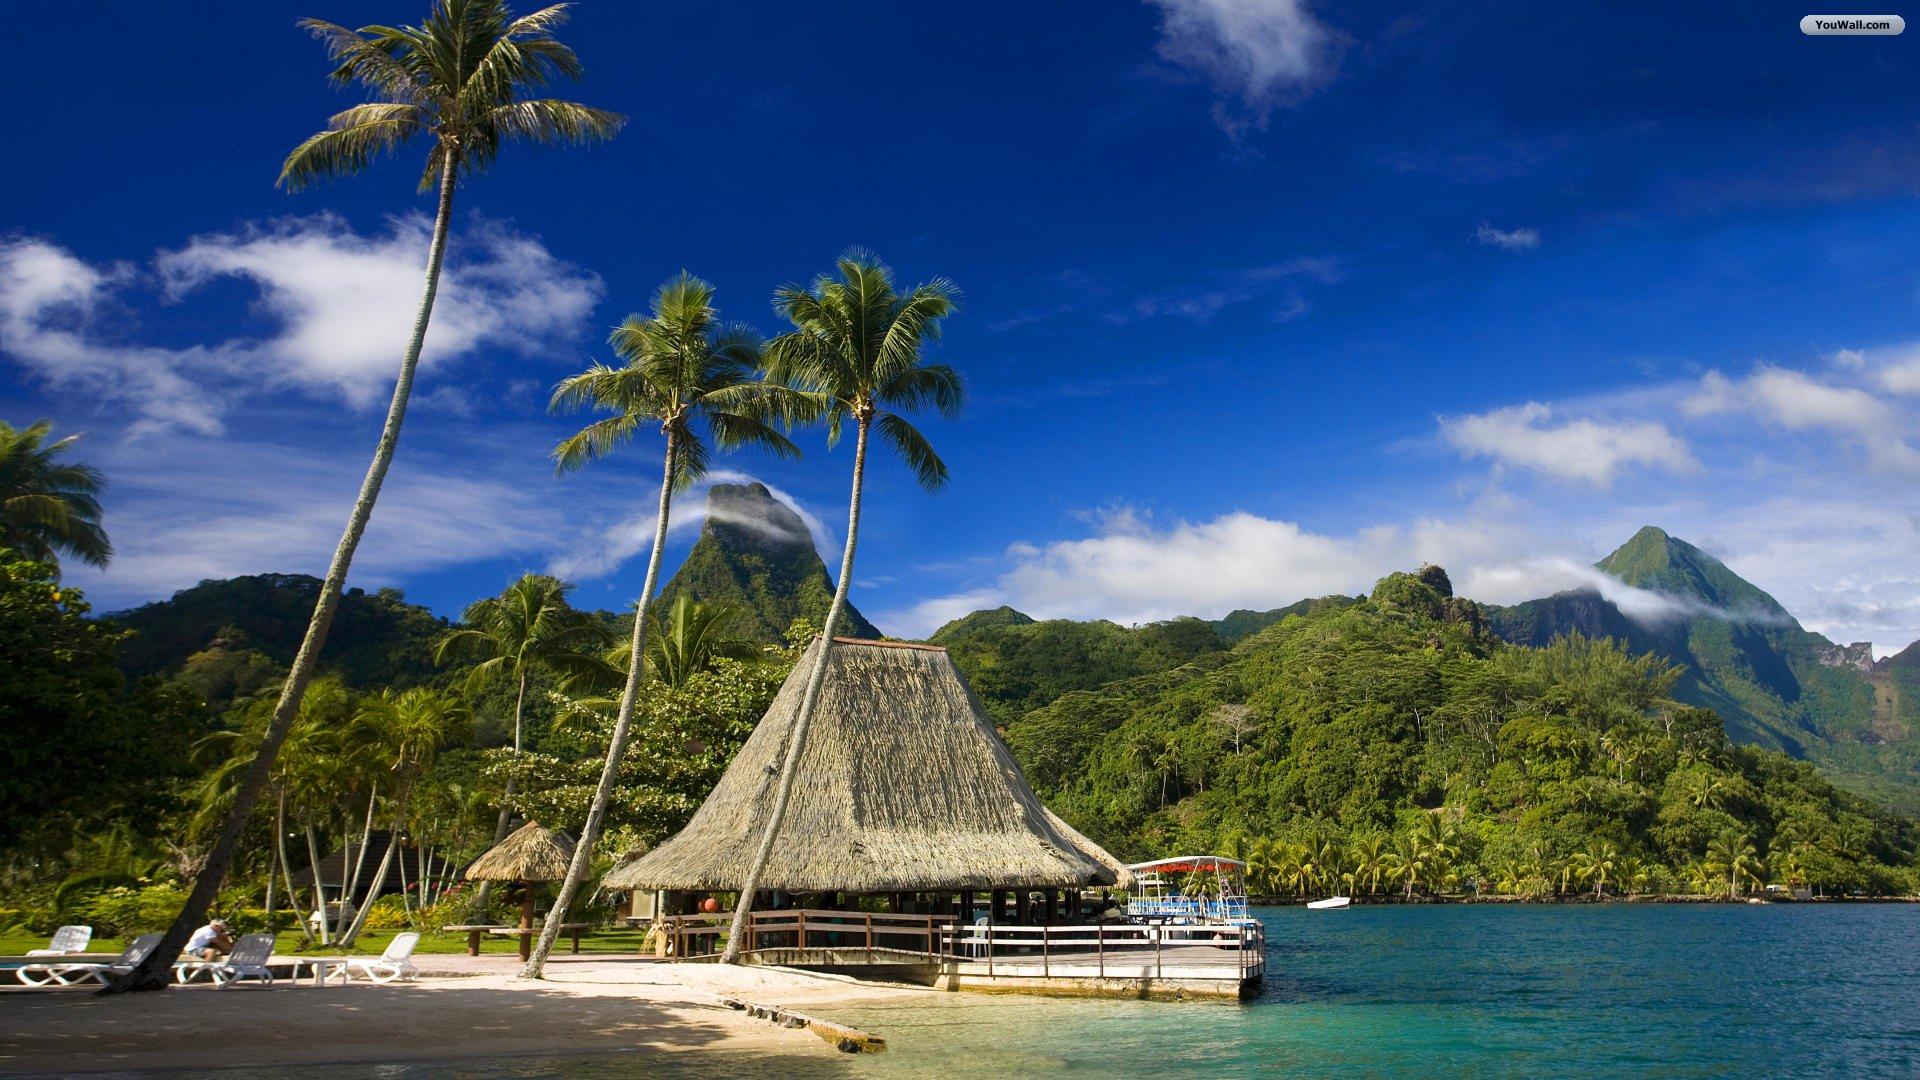 Island Paradise Wallpaper Island HD Wallp...